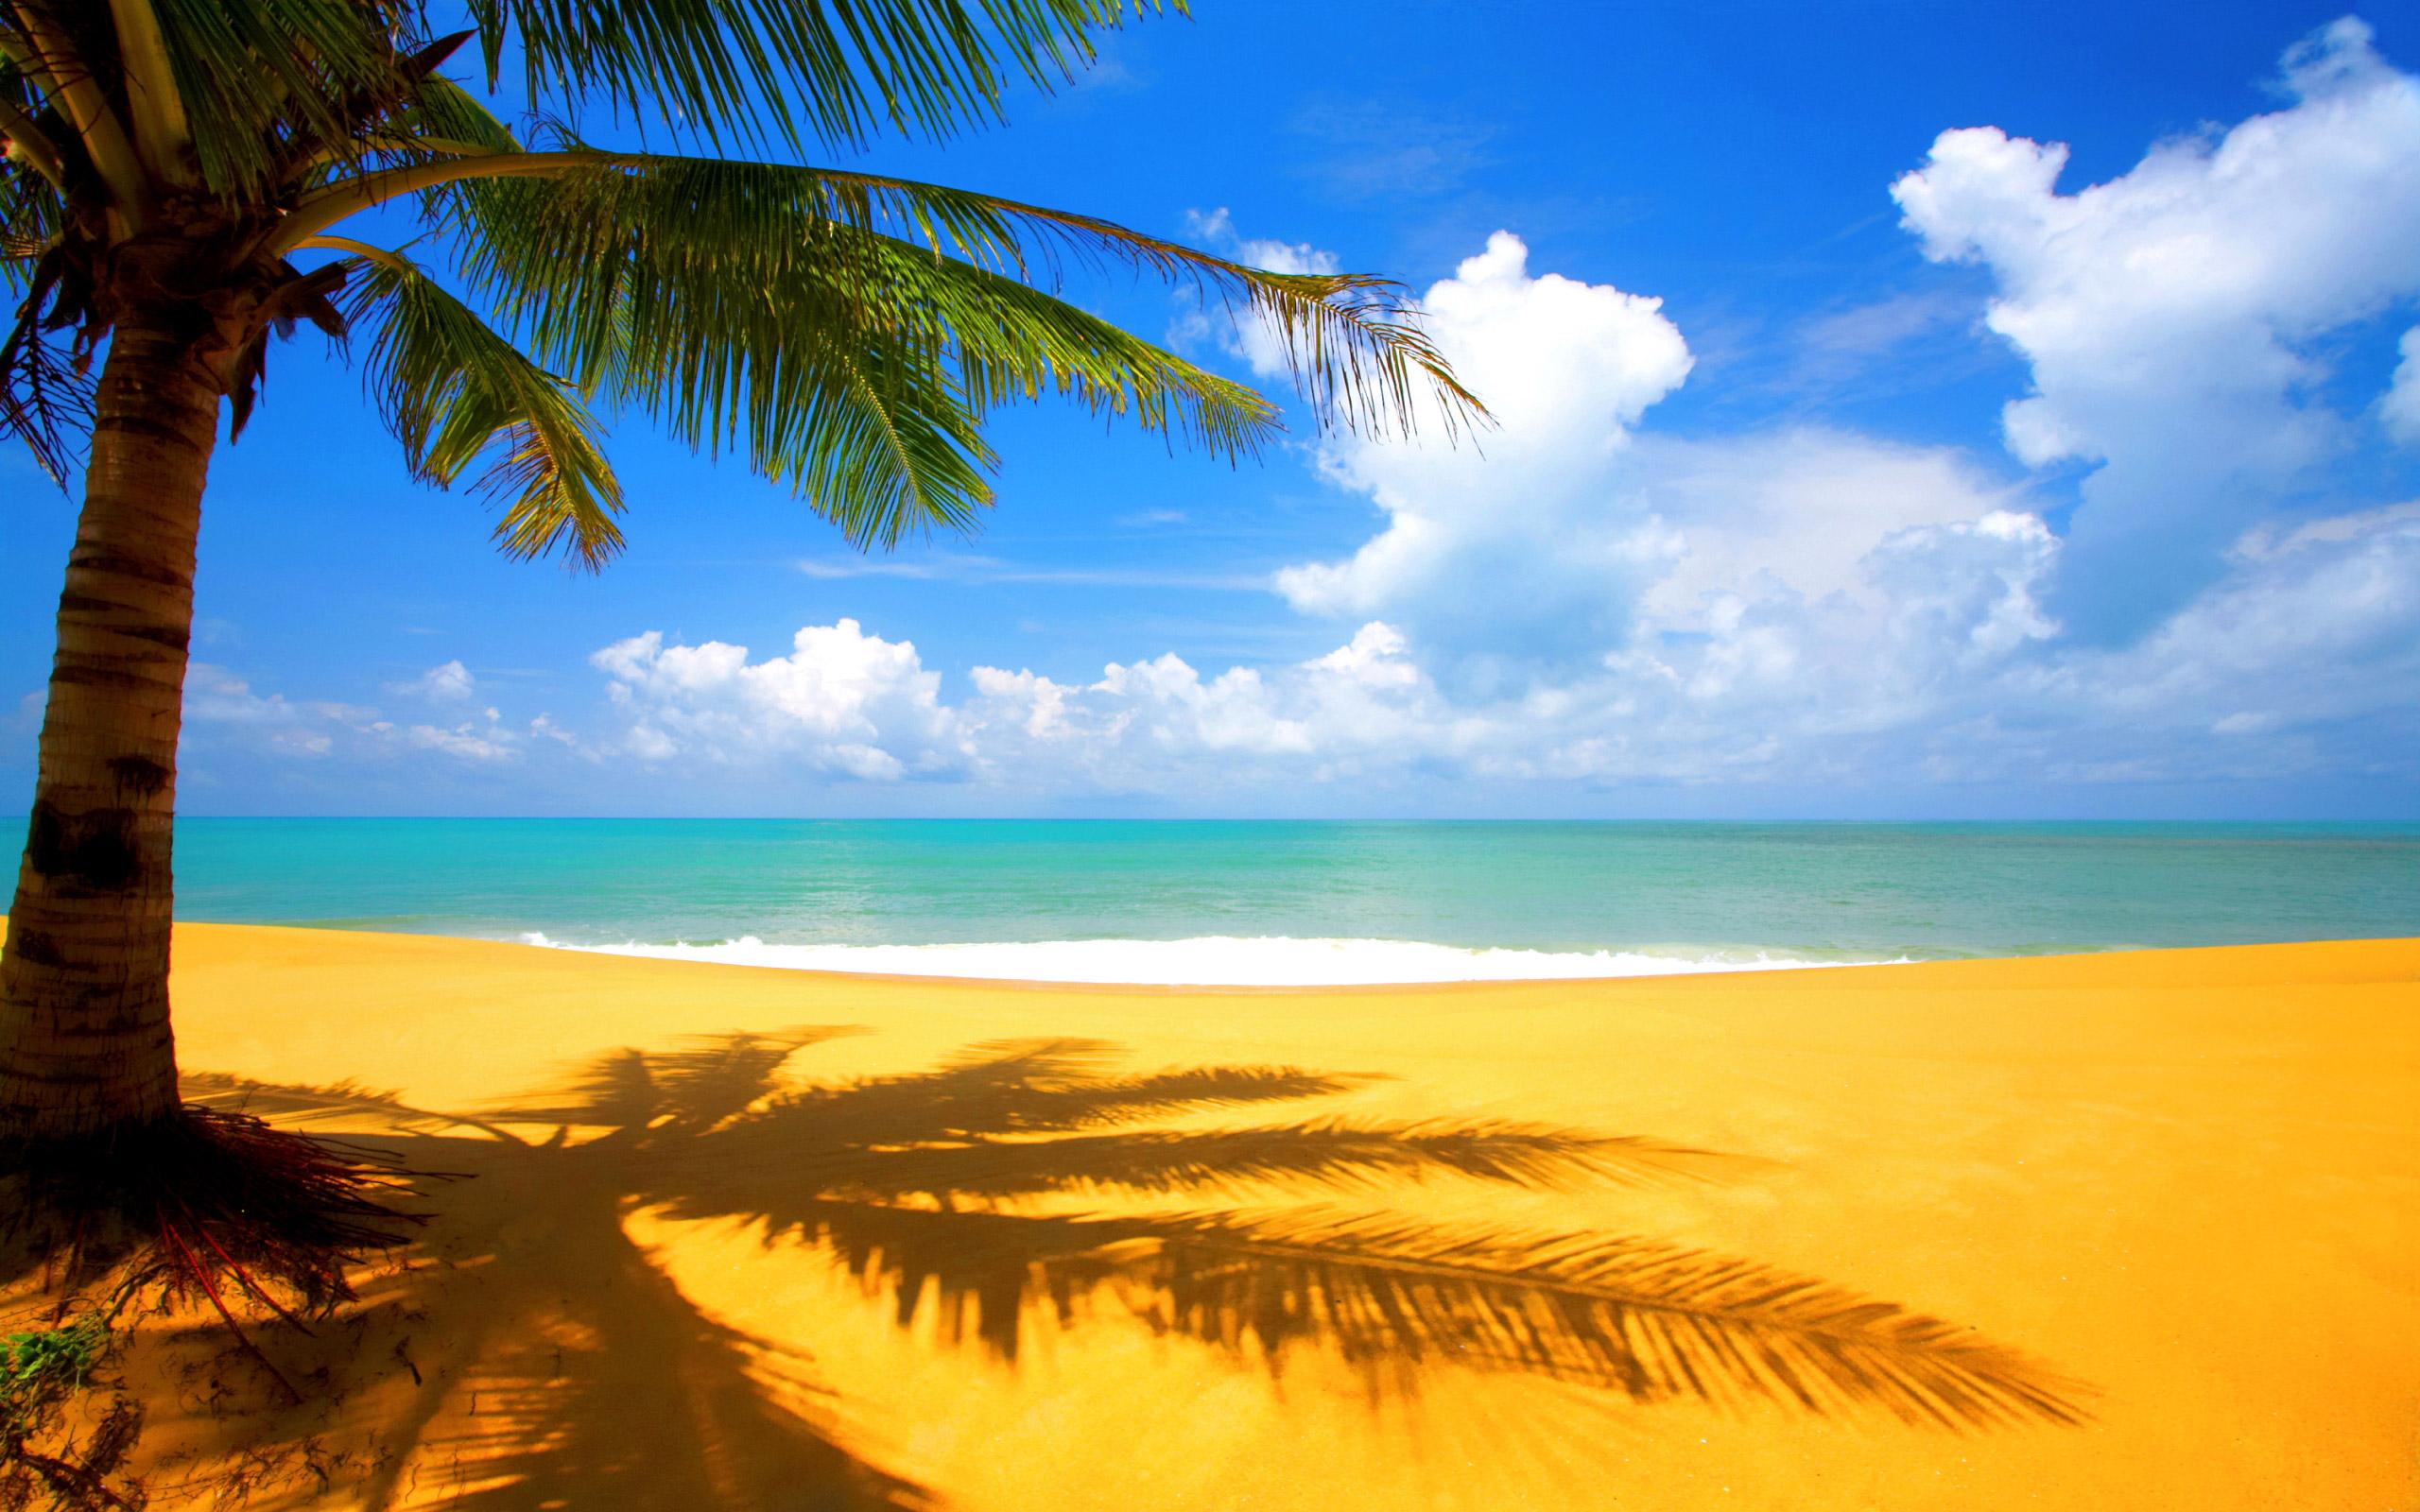 at the beach hd wallpaper 2560x1600jpeg 2560x1600